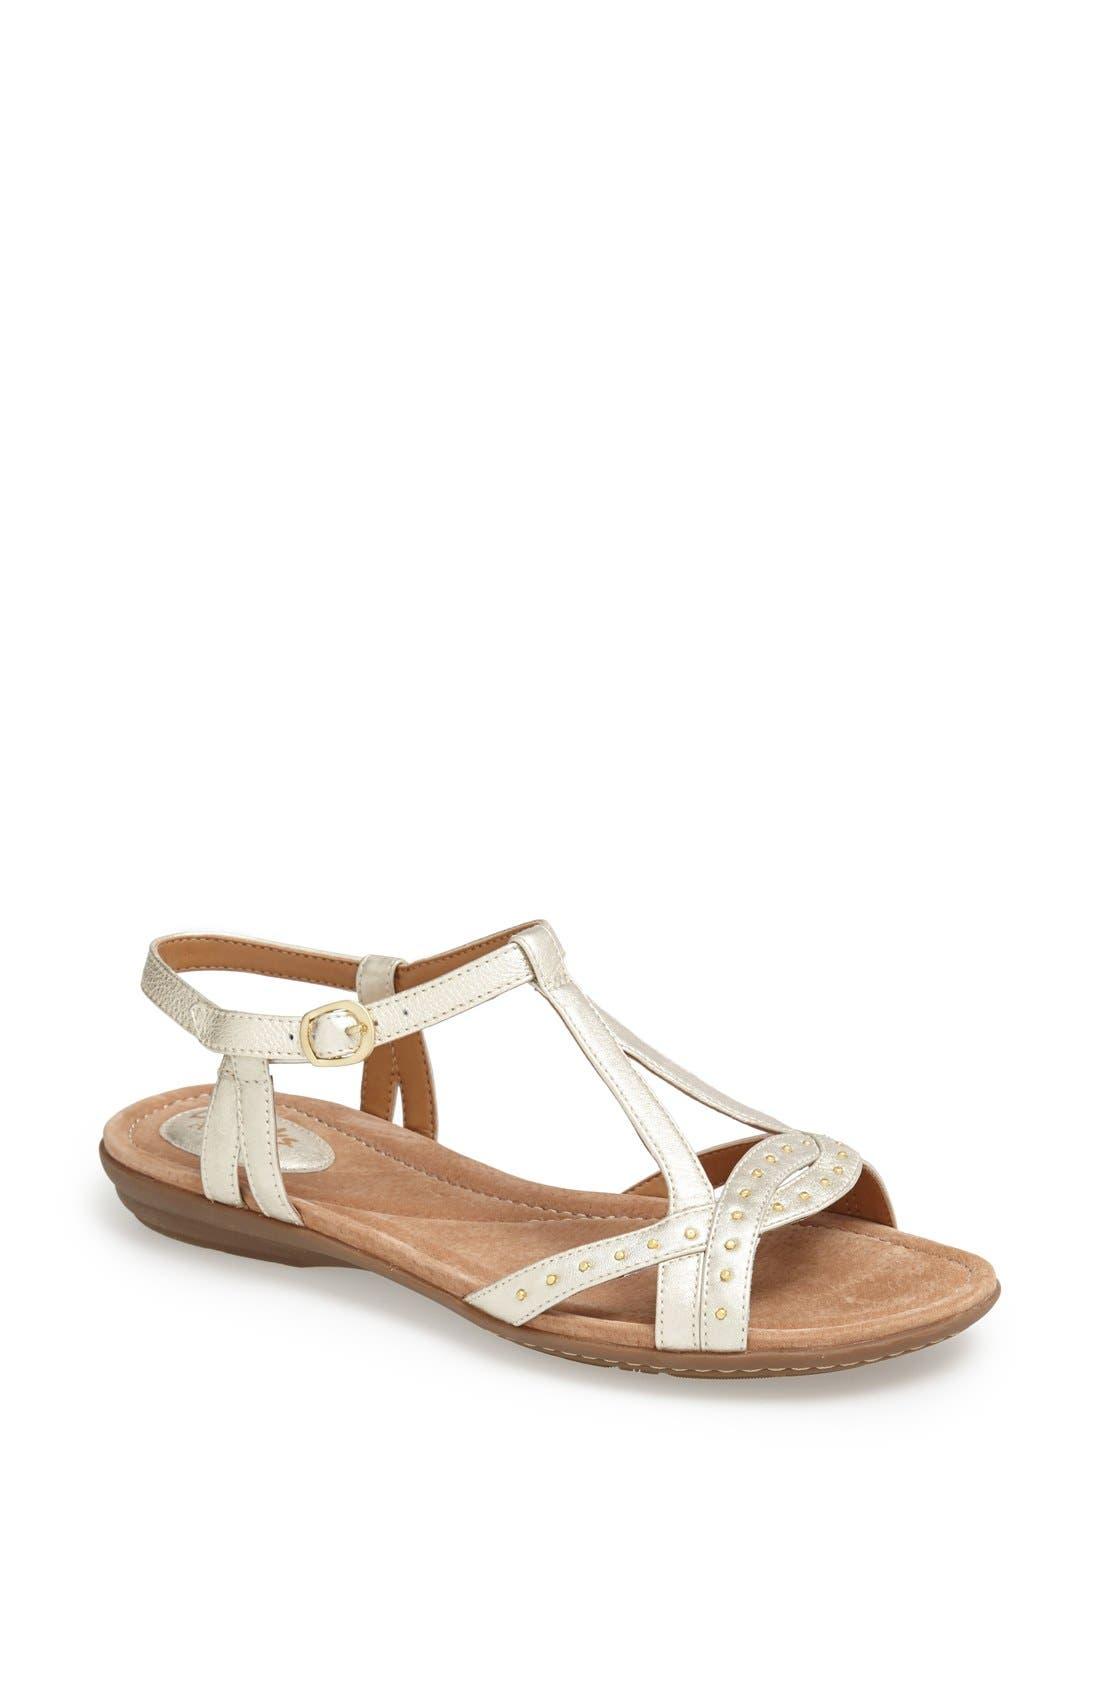 Alternate Image 1 Selected - Clarks® 'Roya Vanna' Sandal